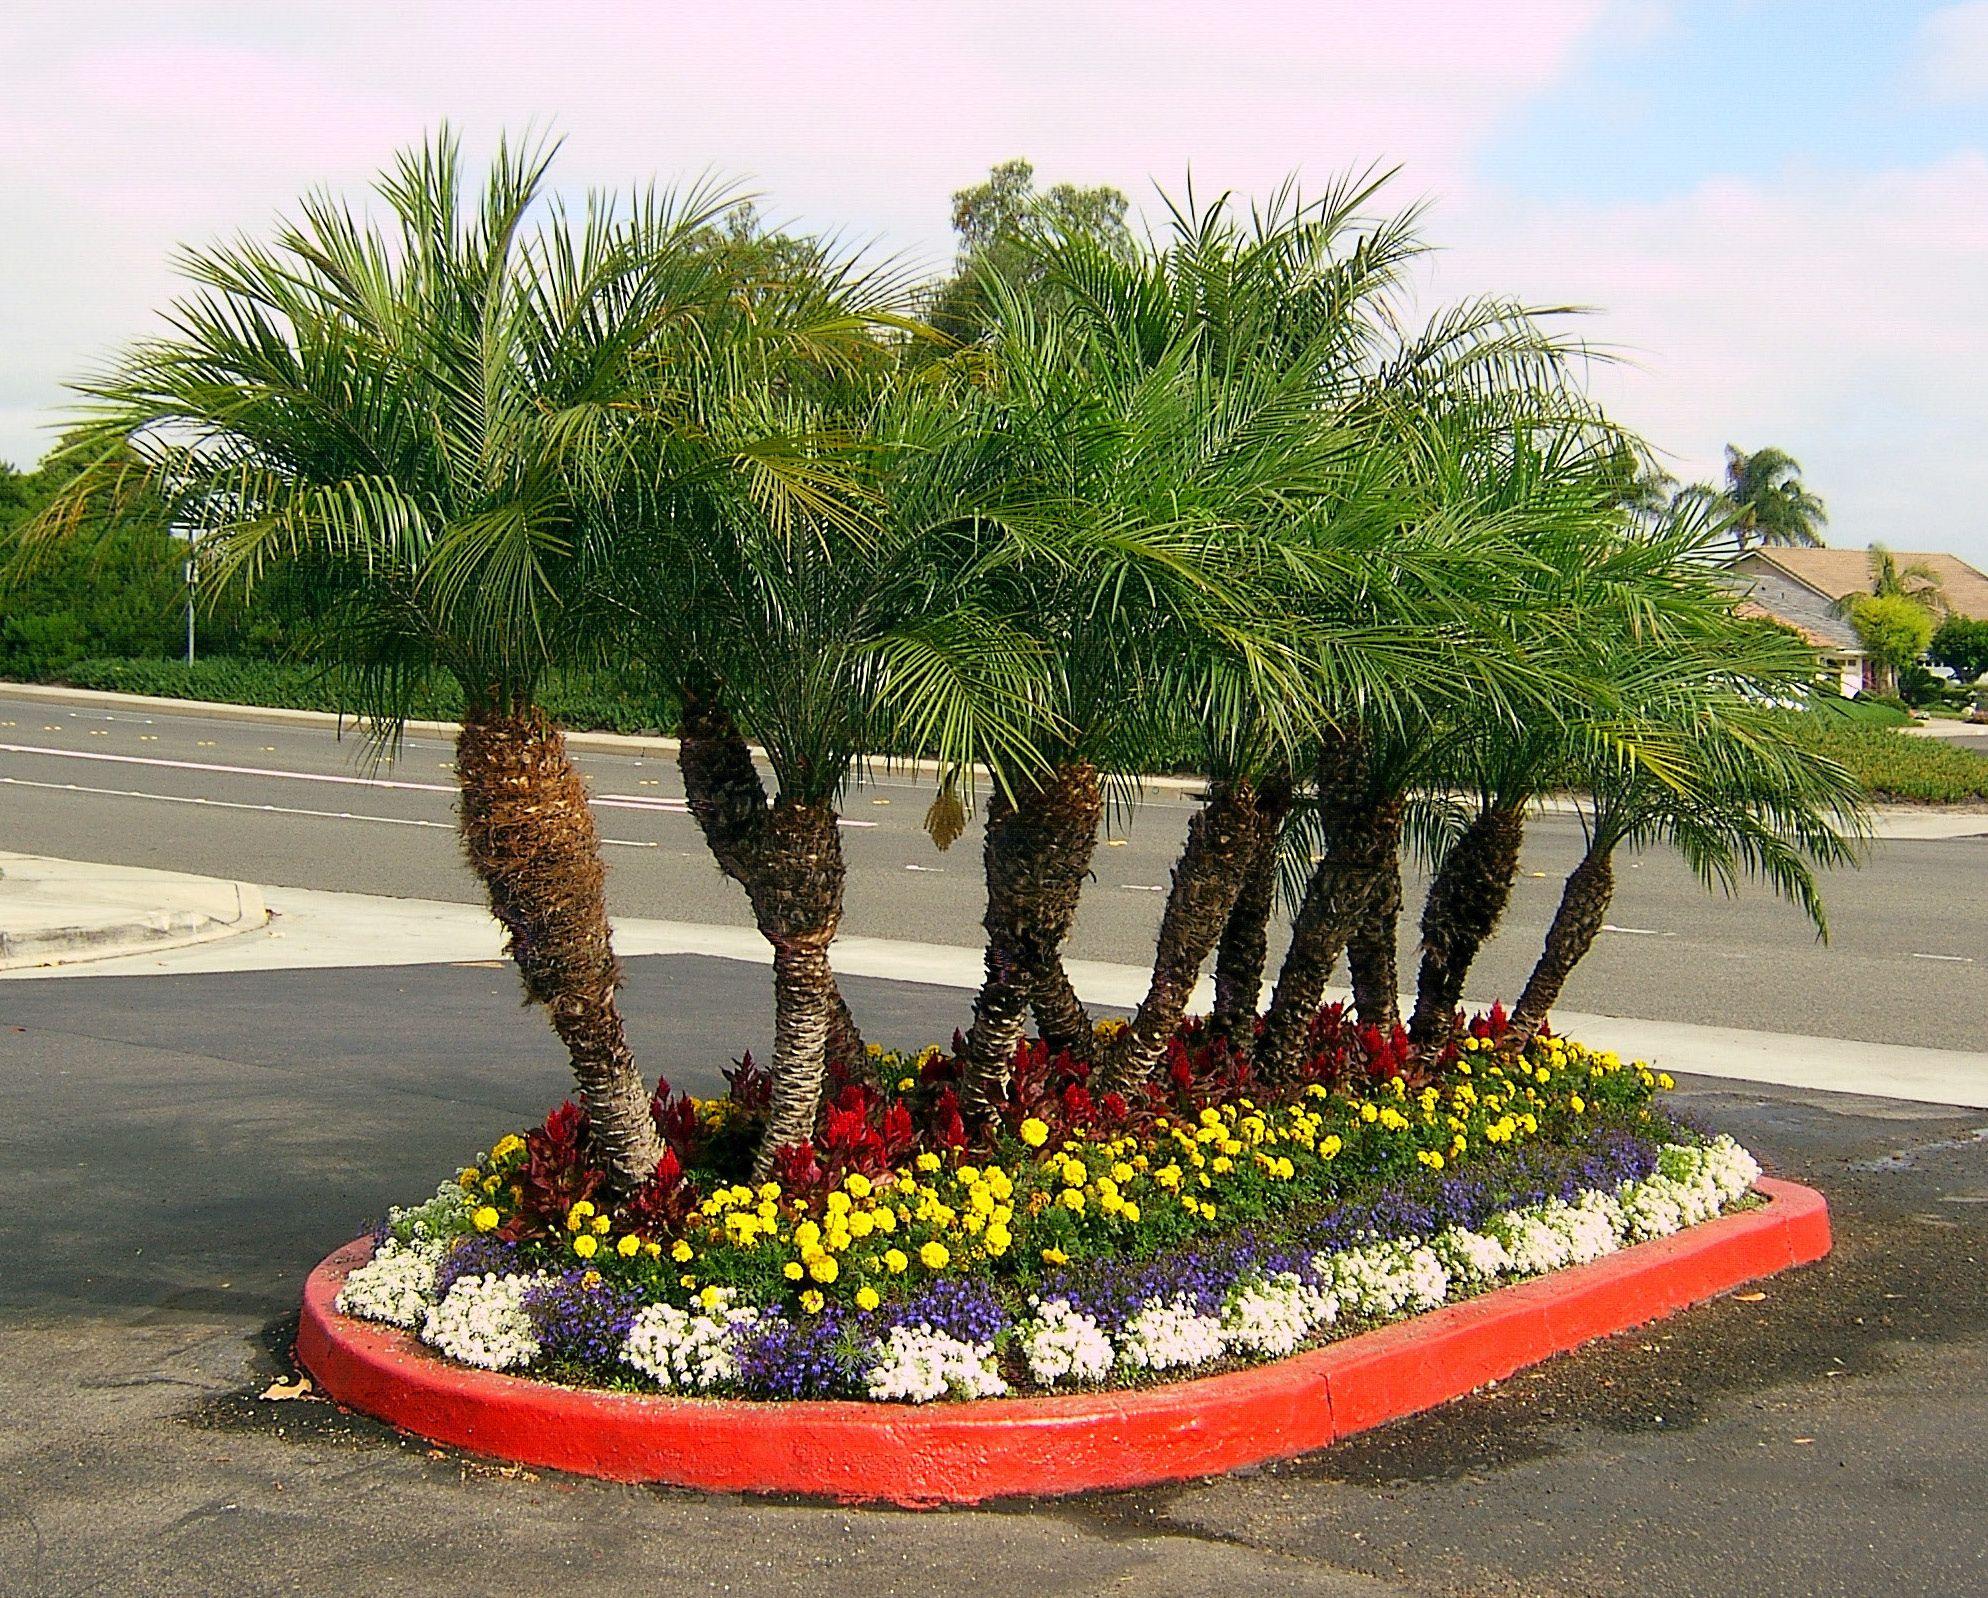 palm trees in the landscape palm tree floral landscaping. Black Bedroom Furniture Sets. Home Design Ideas